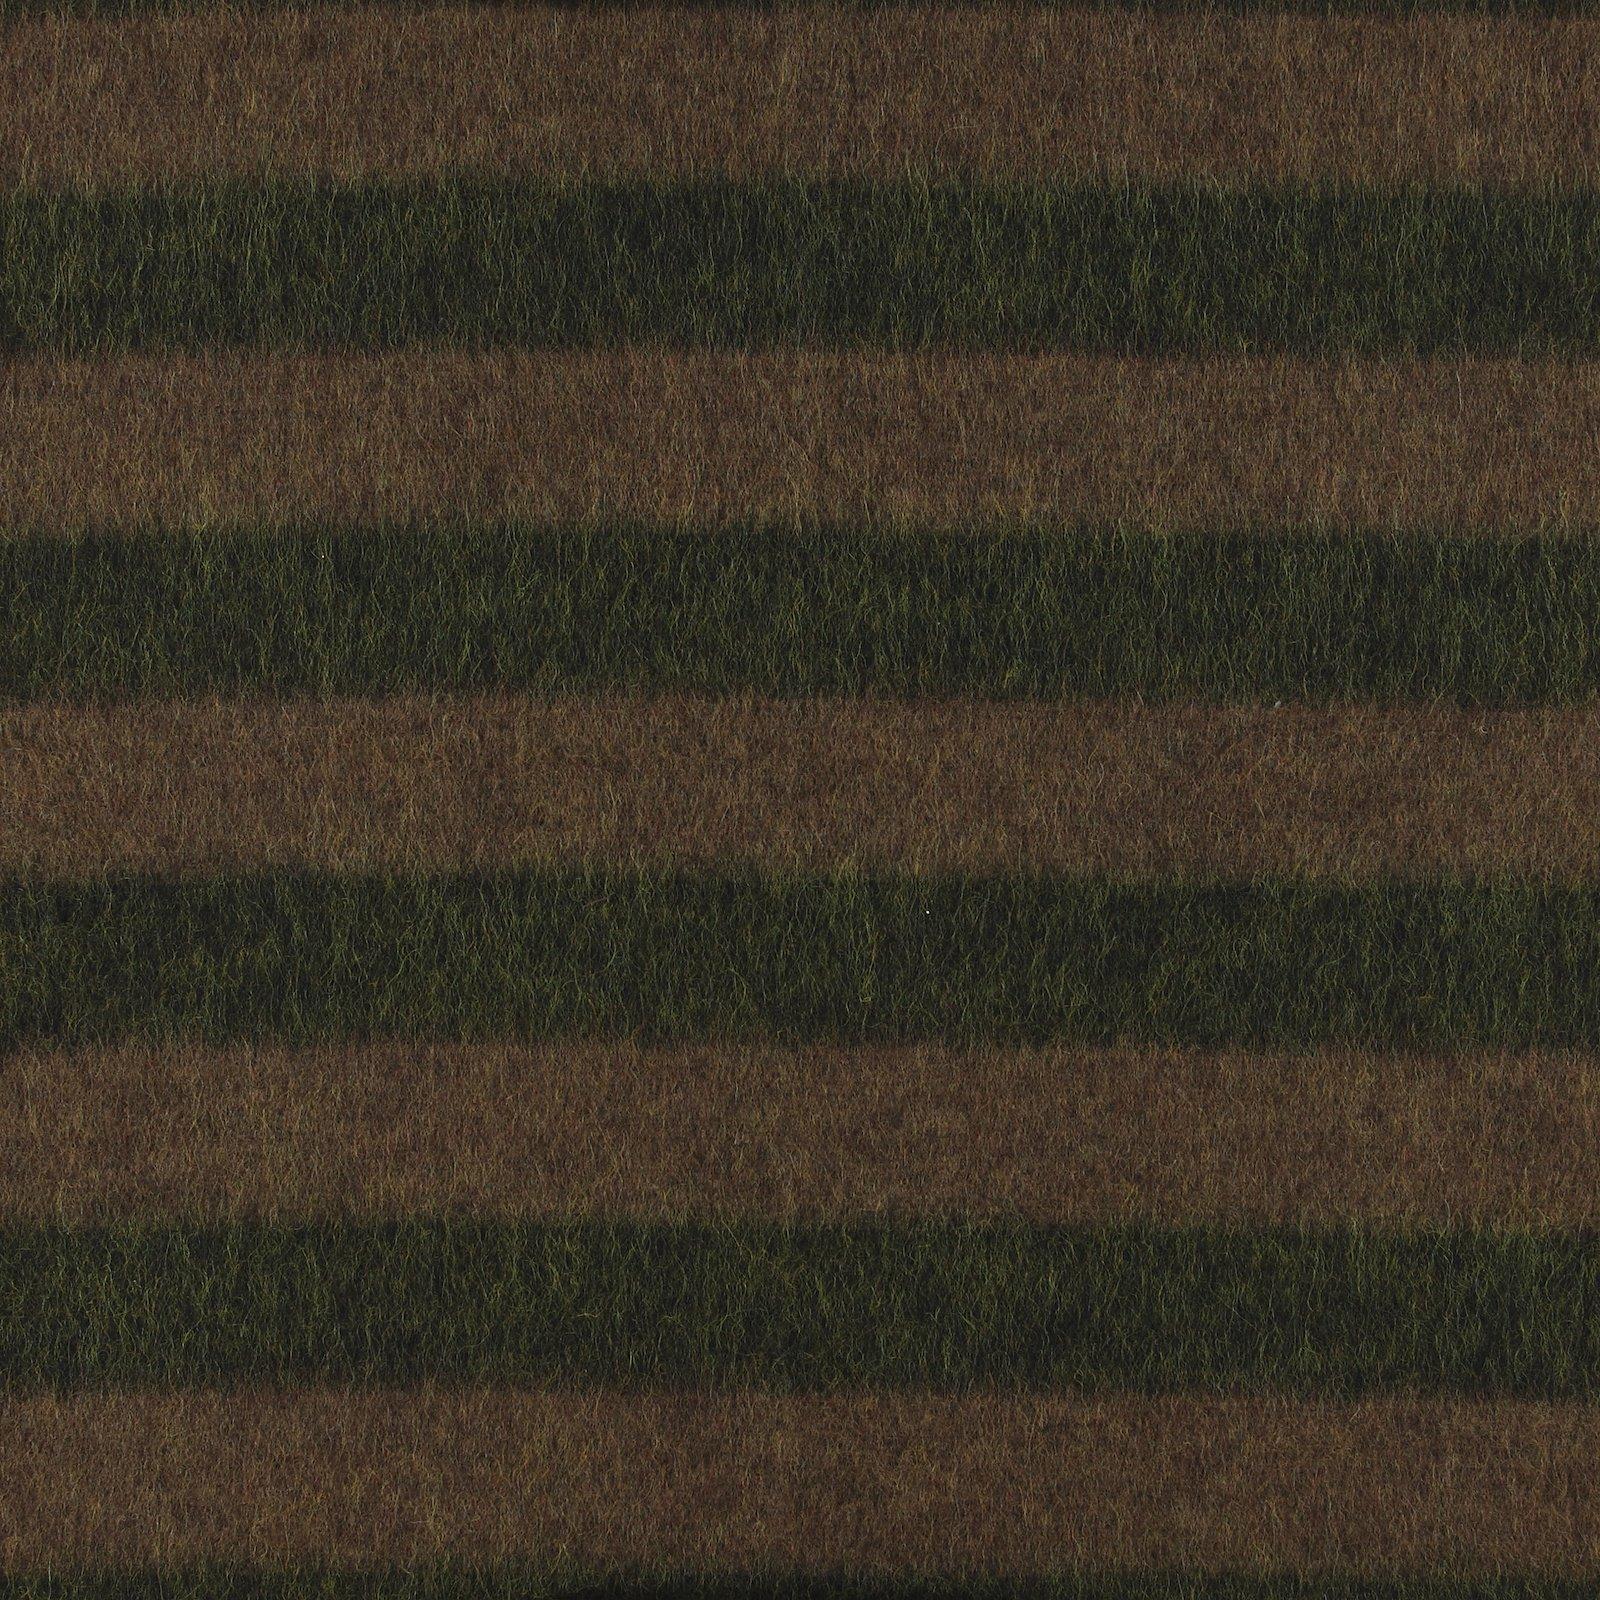 Woven wool brown/green block stripe 300194_pack_sp